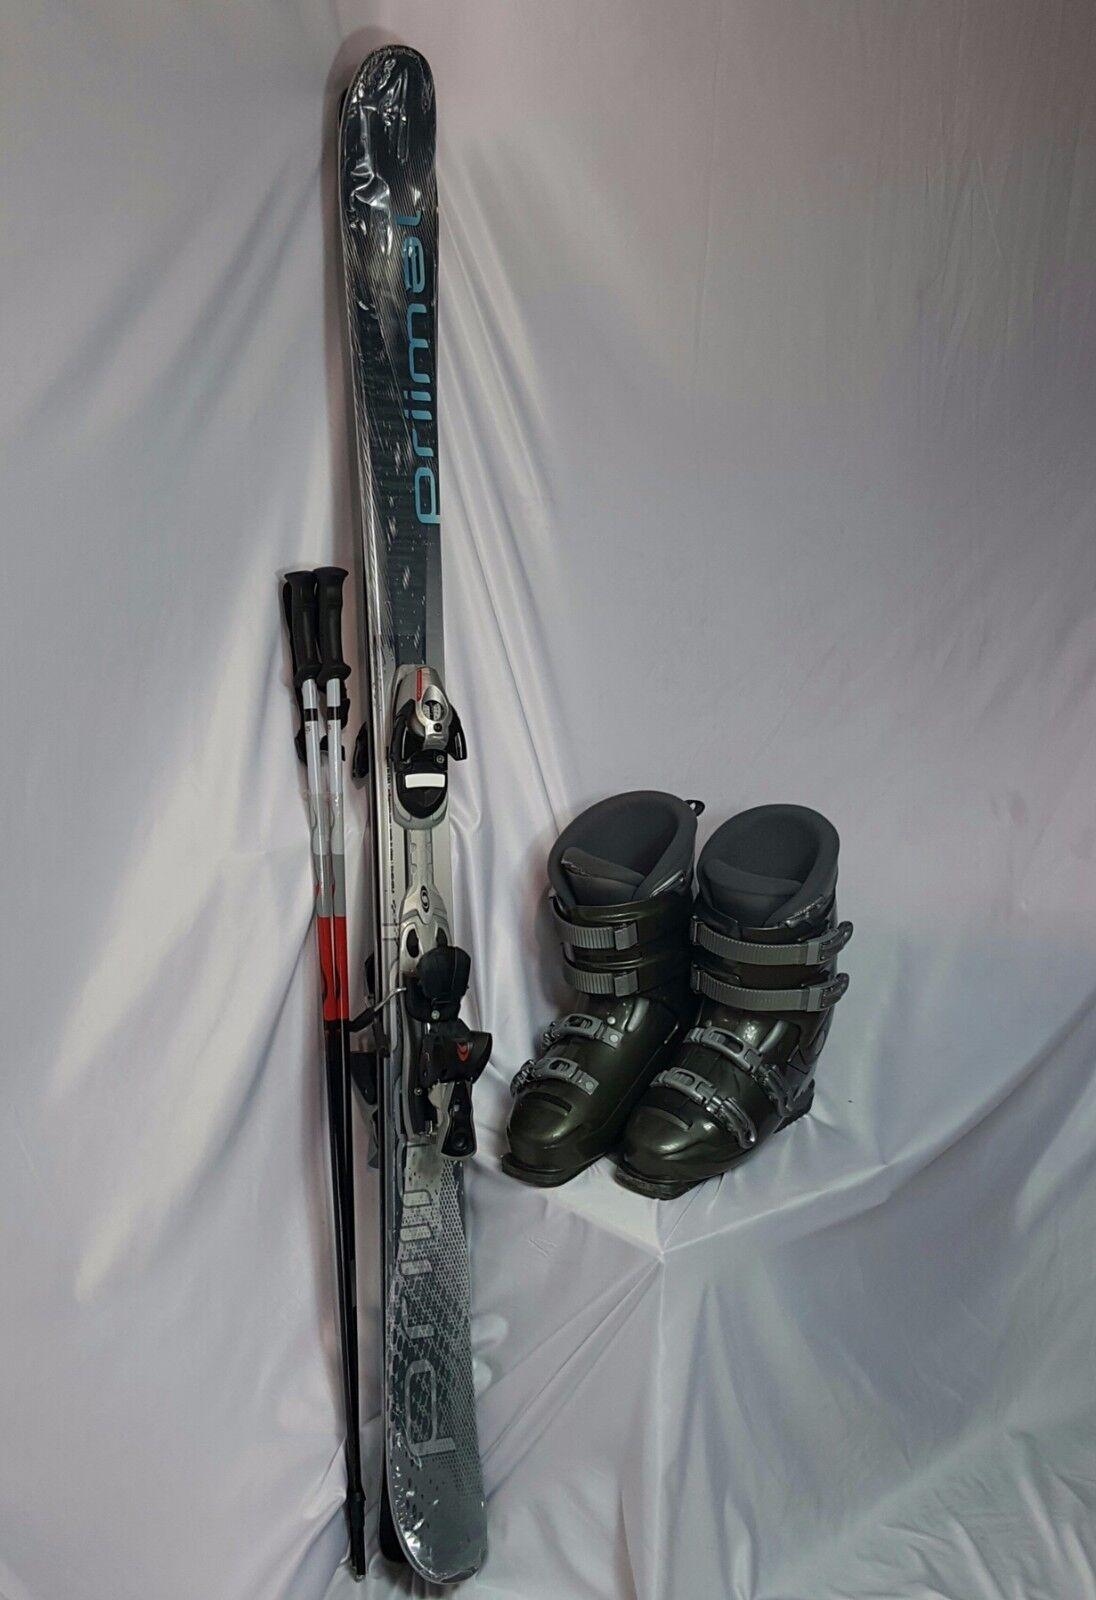 TWIN TIP SKI PKG, Primal 155cm & Poles, Used Used Used Salomon Bdg, Dalbello Stiefel+FITTING c5a034